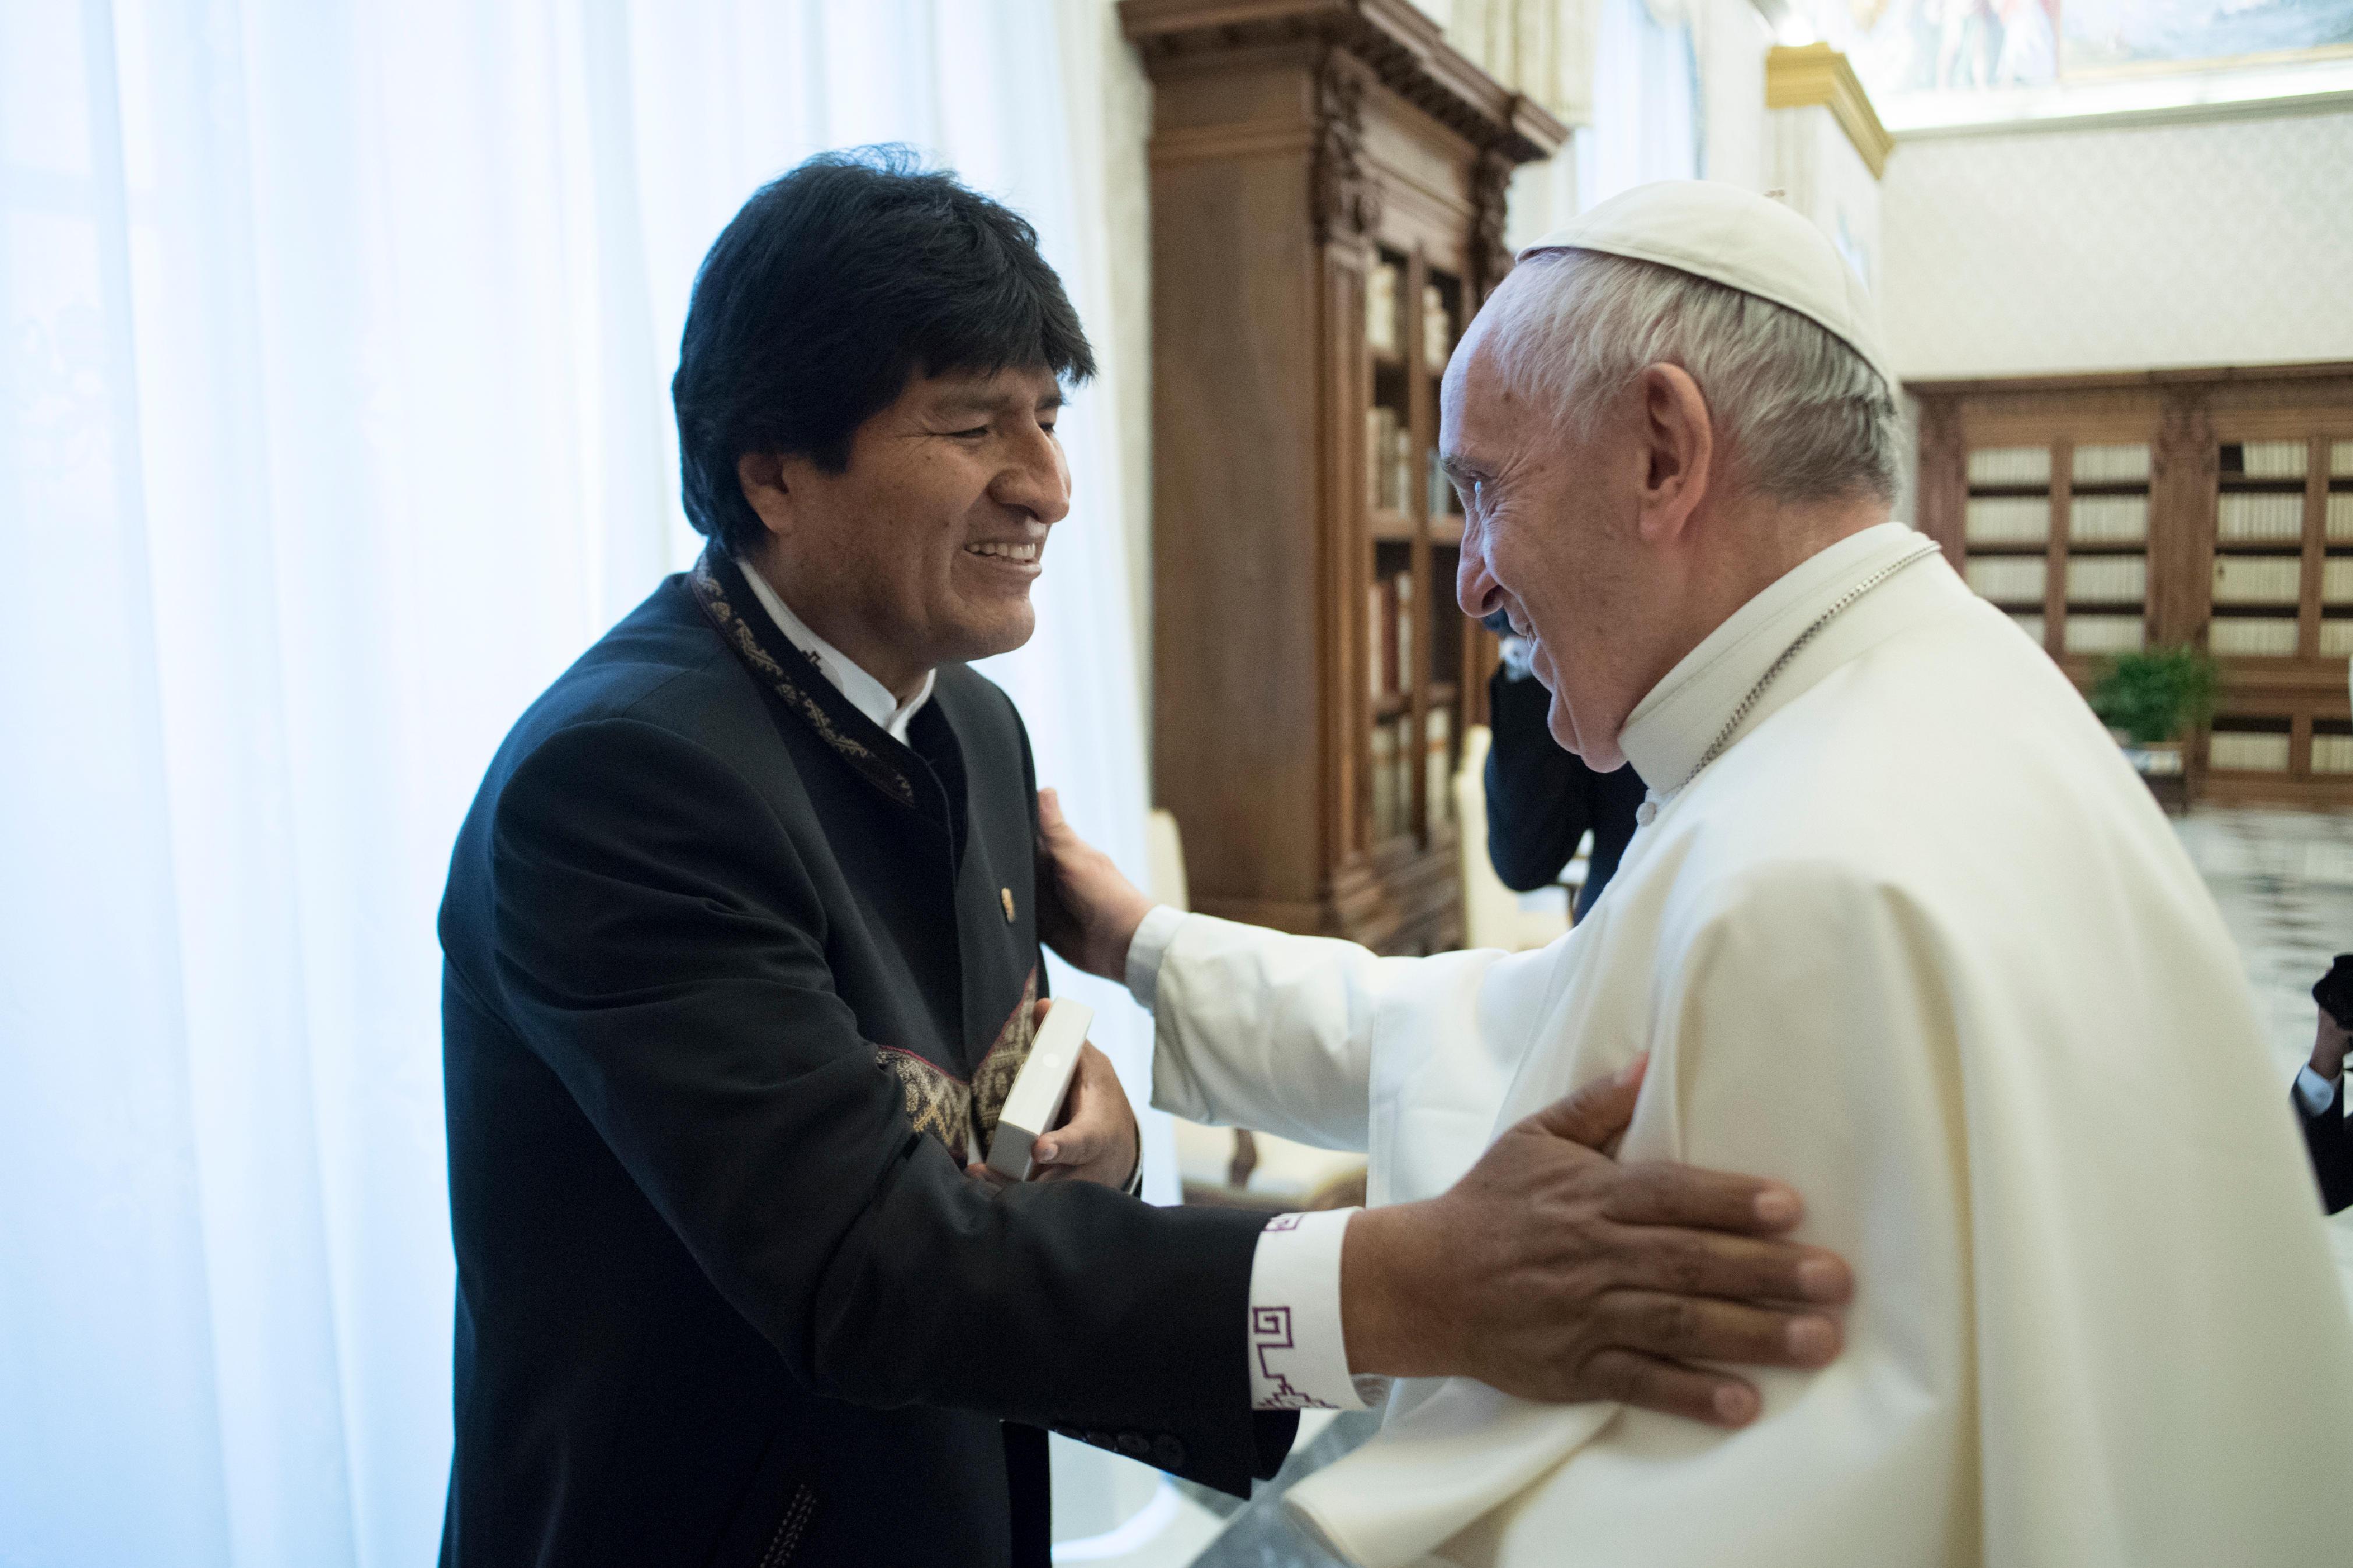 El Papa Francisco saluda al Presidente Evo Morales © L´Osservatore Romano